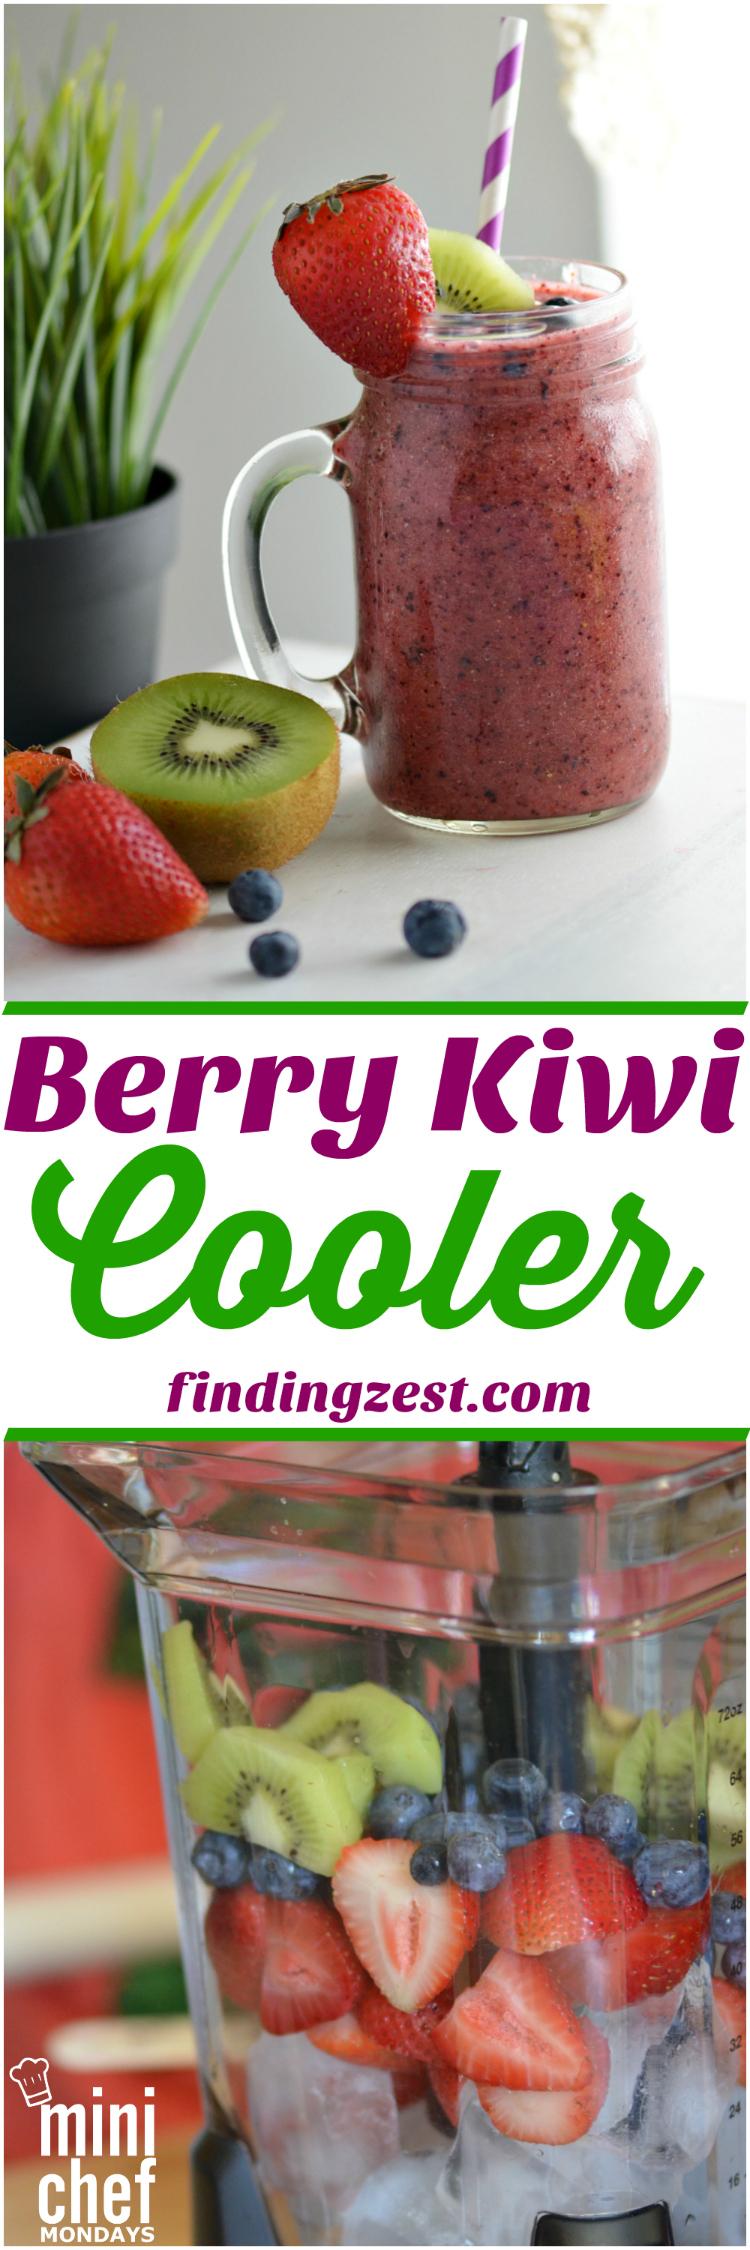 Berry Kiwi Cooler